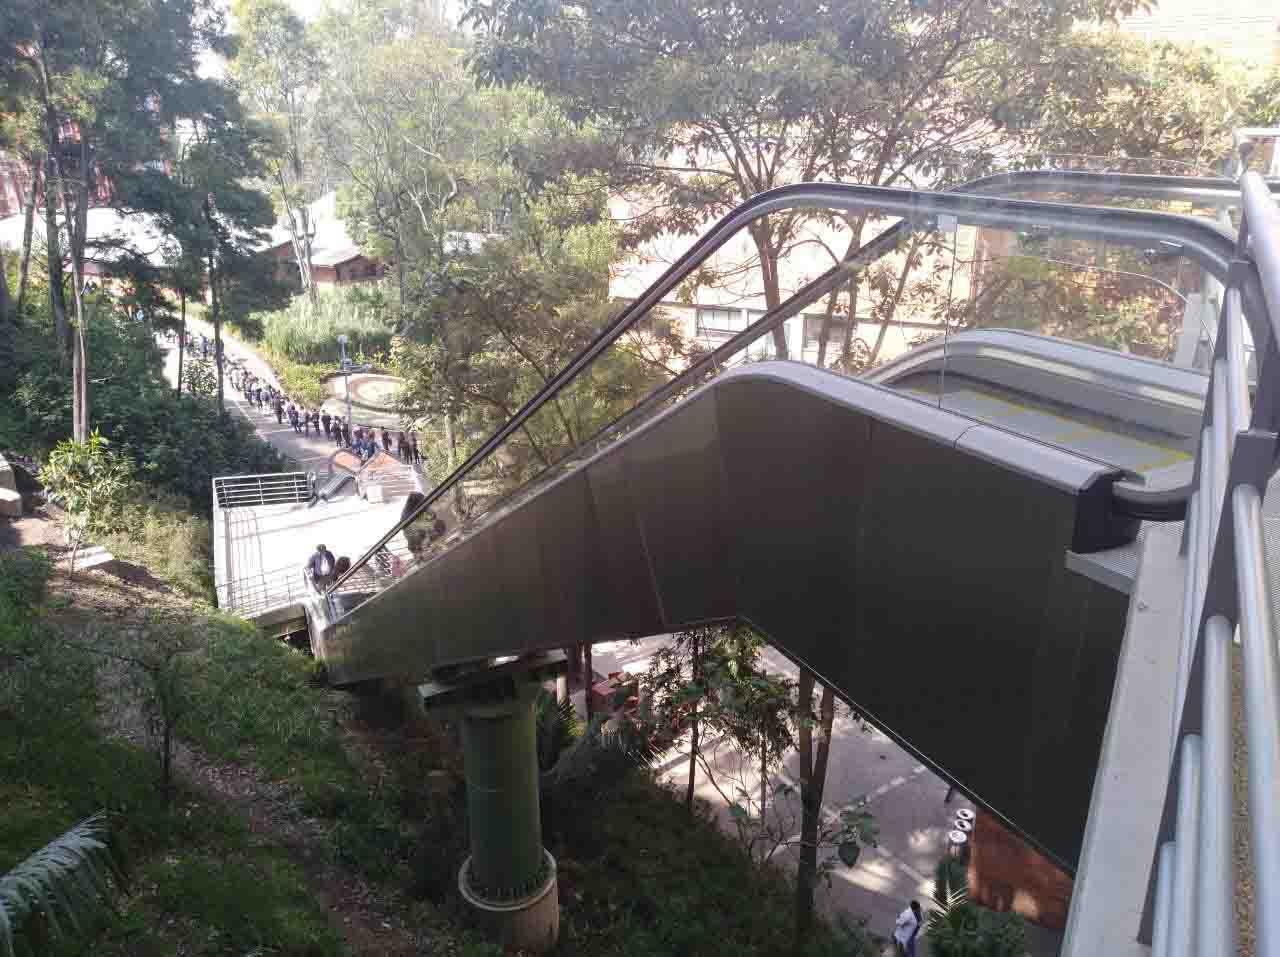 Universidad Javeriana escalera electrica